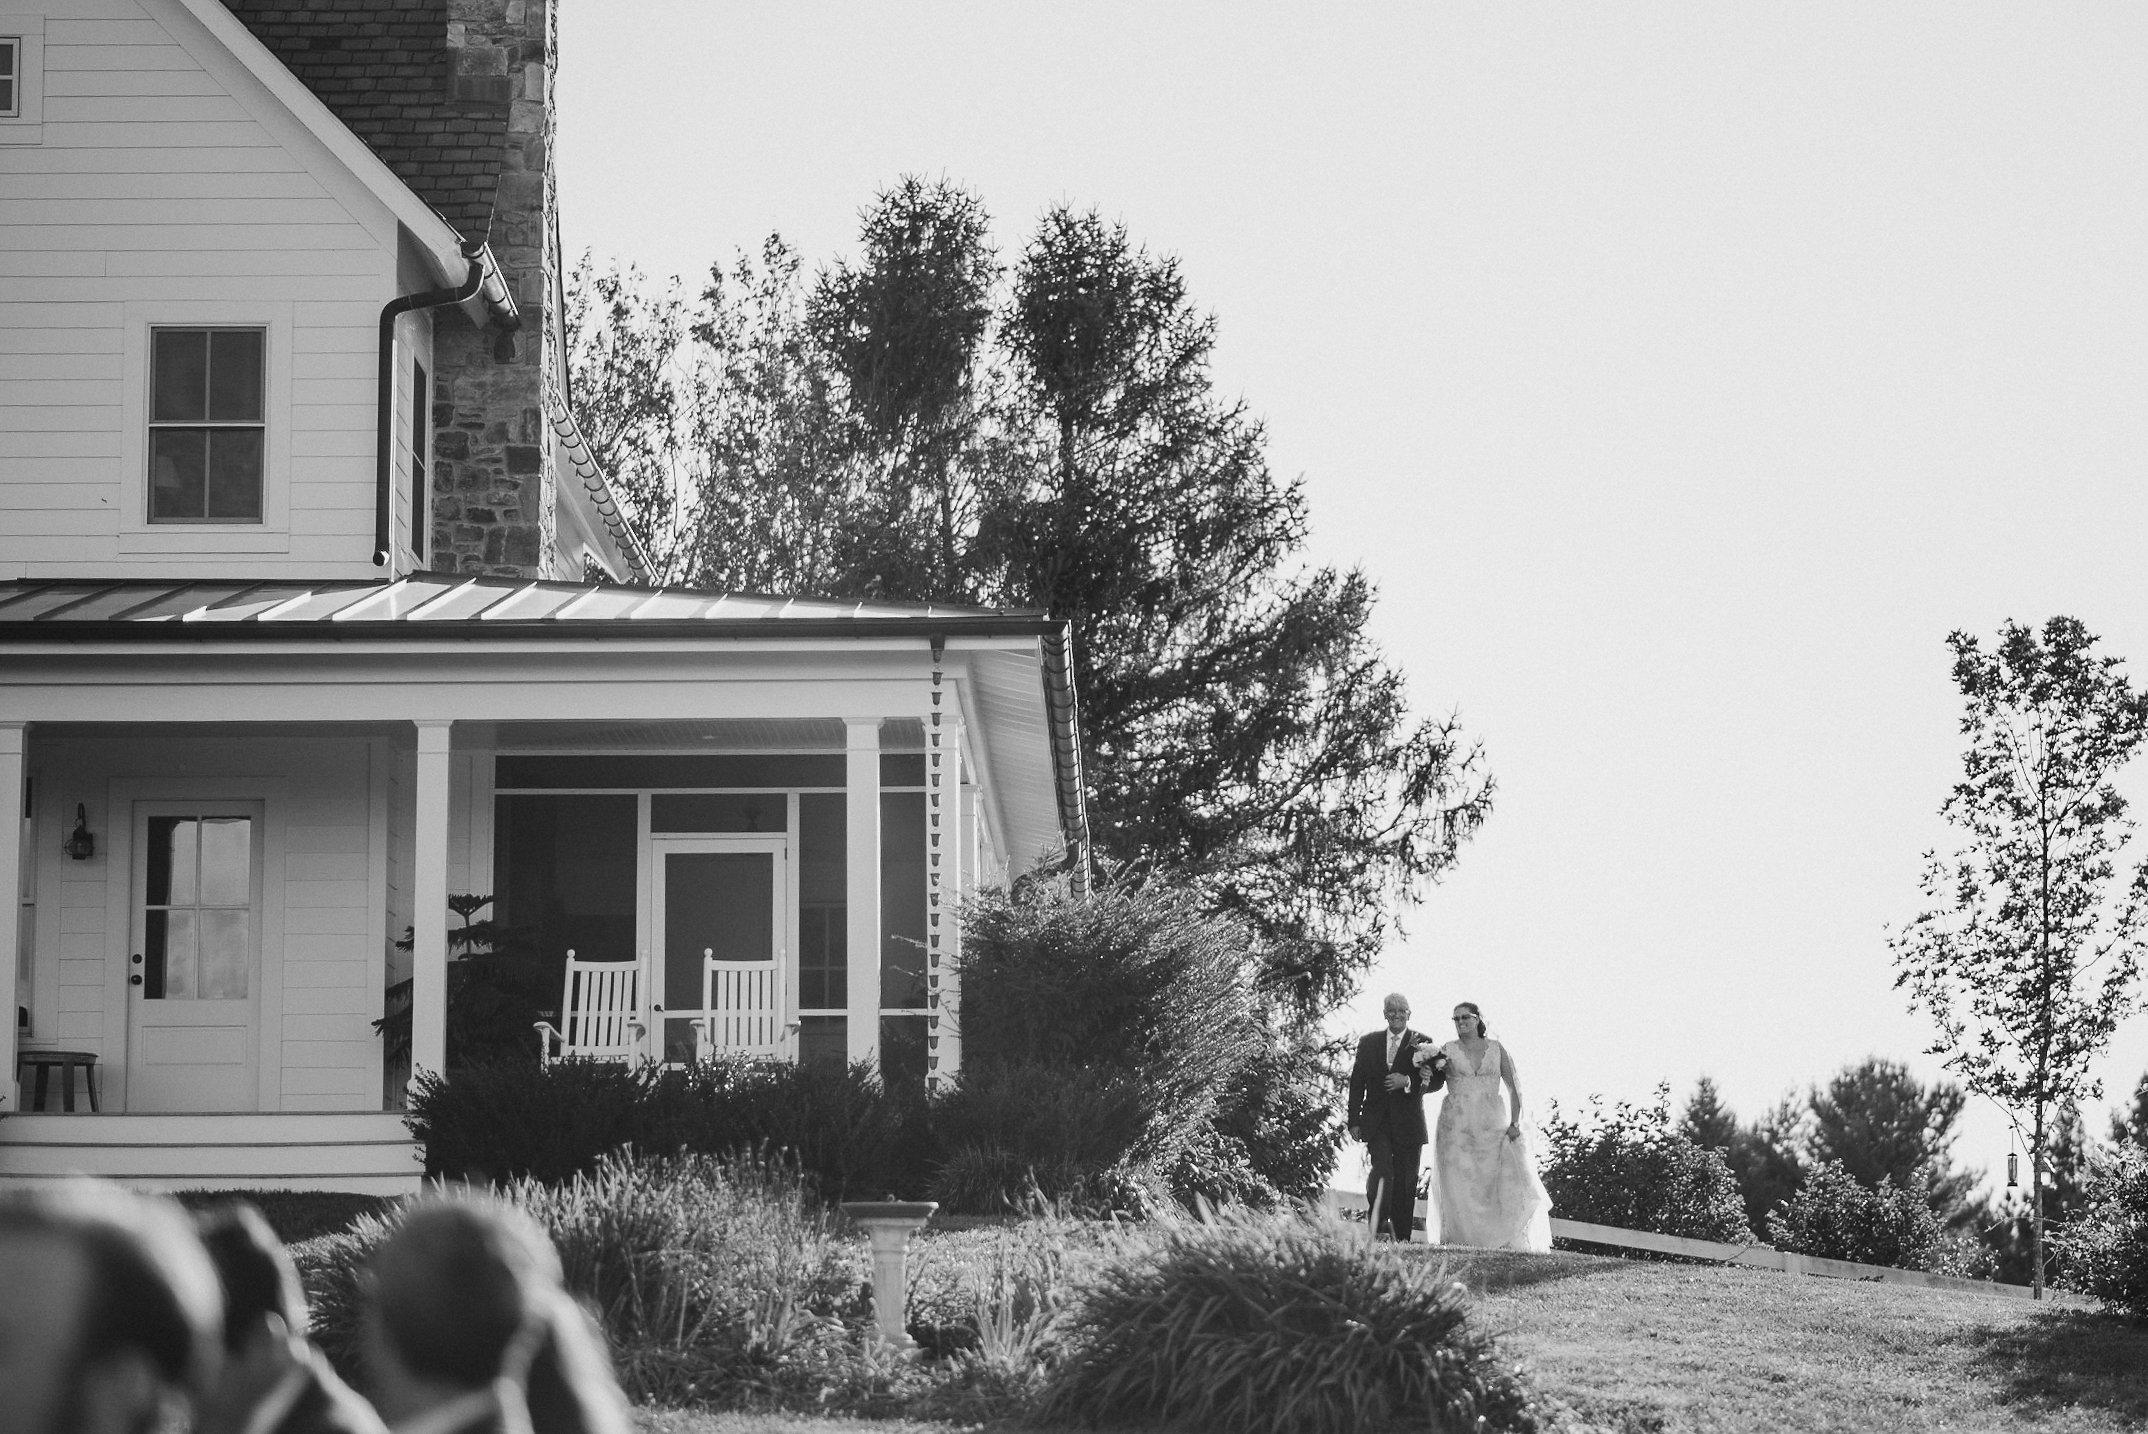 Father walking bride to wedding